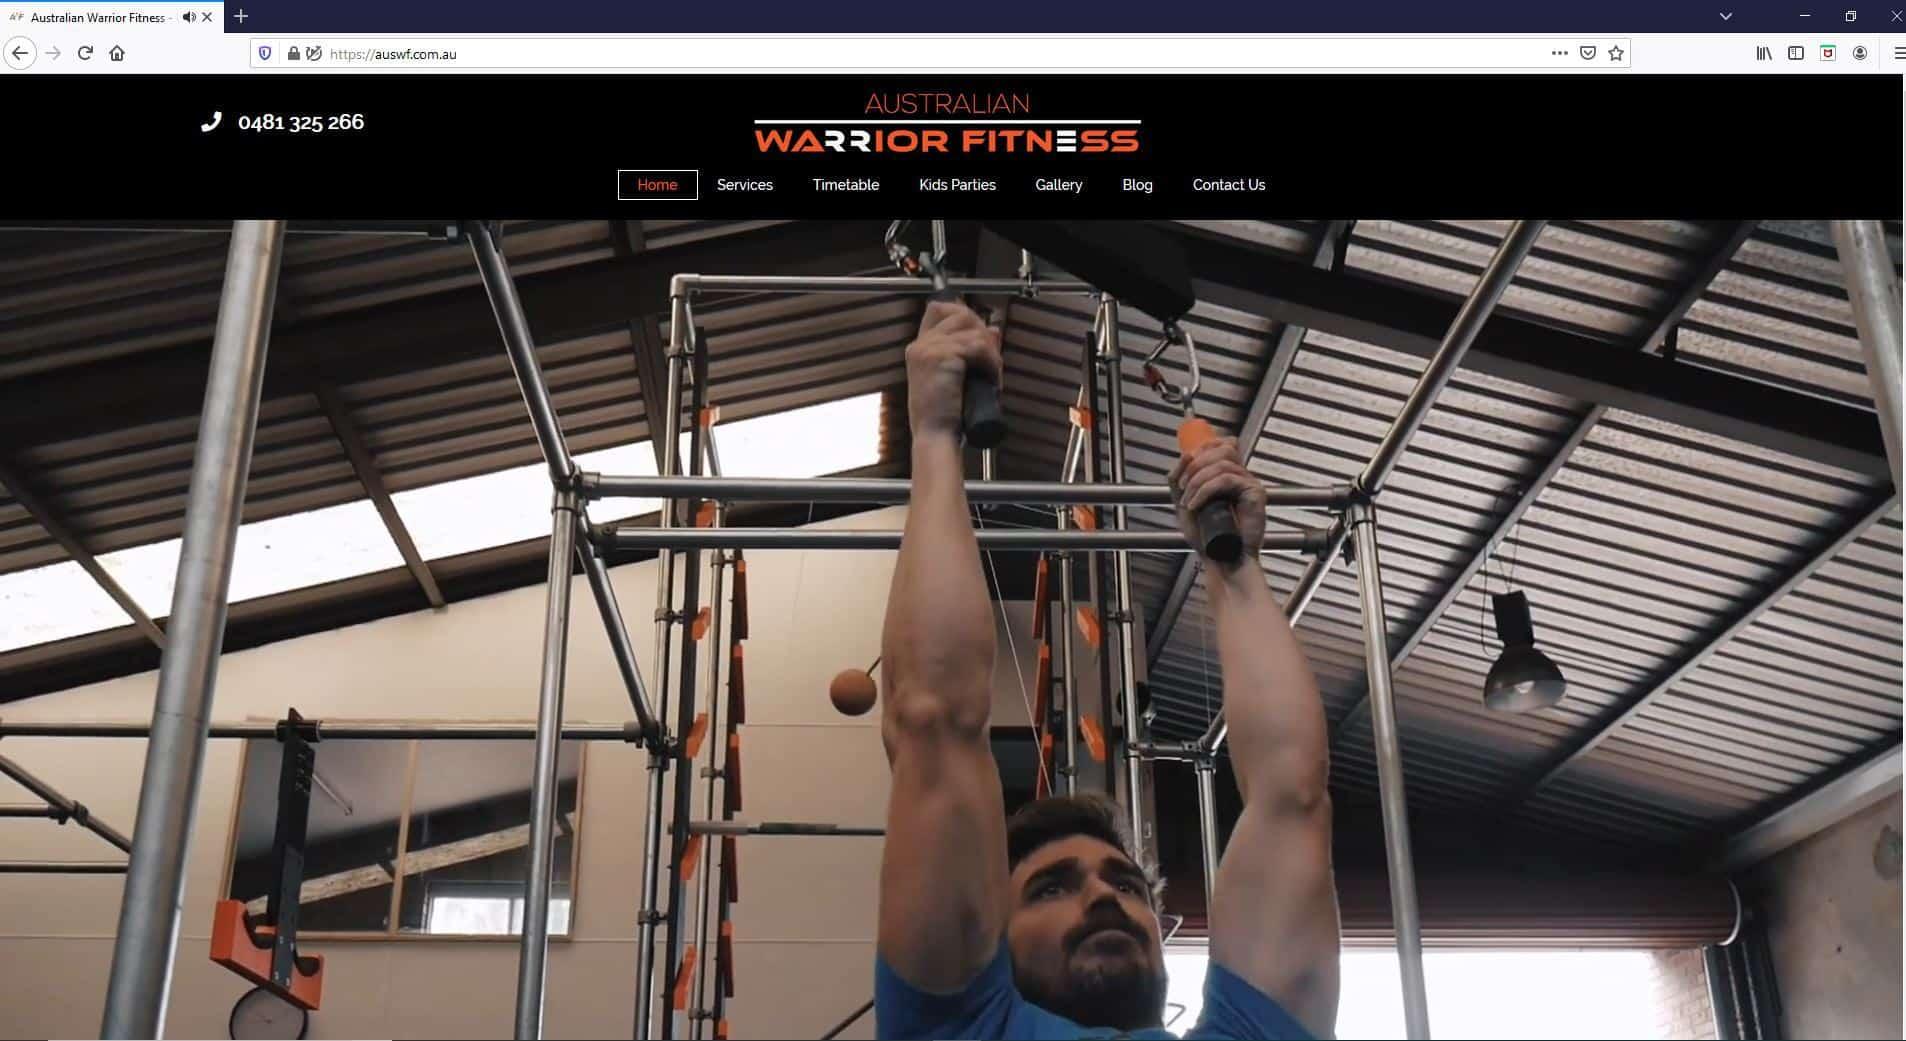 Australian Warrior Fitness Website Screenshot